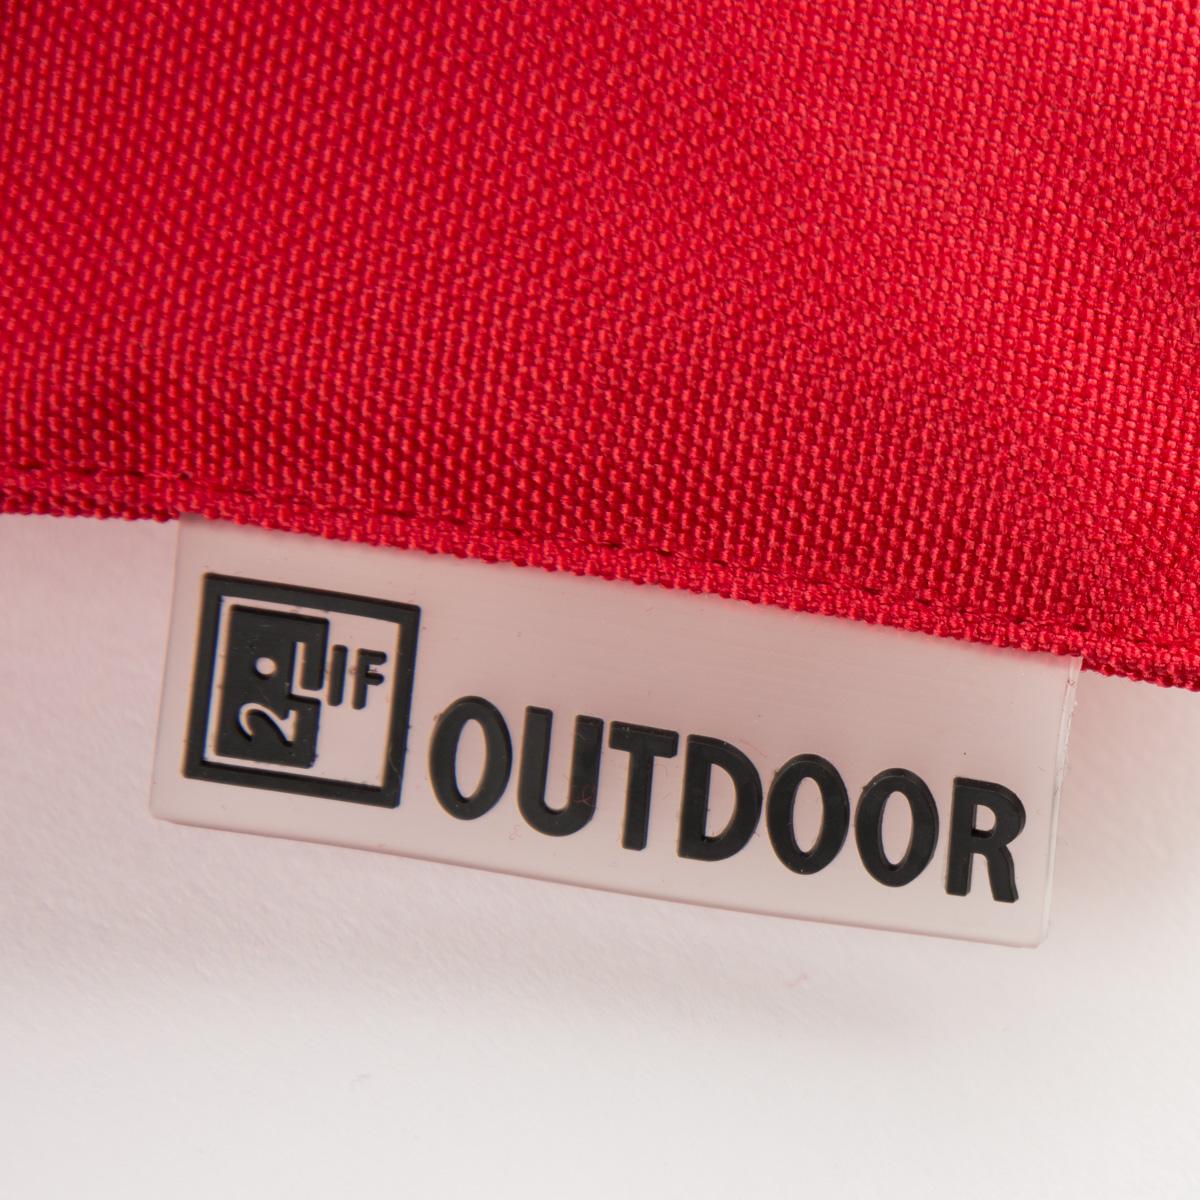 outdoor garten kissen st tropez rot 47x47cm wohntextilien kissen outdoorkissen. Black Bedroom Furniture Sets. Home Design Ideas